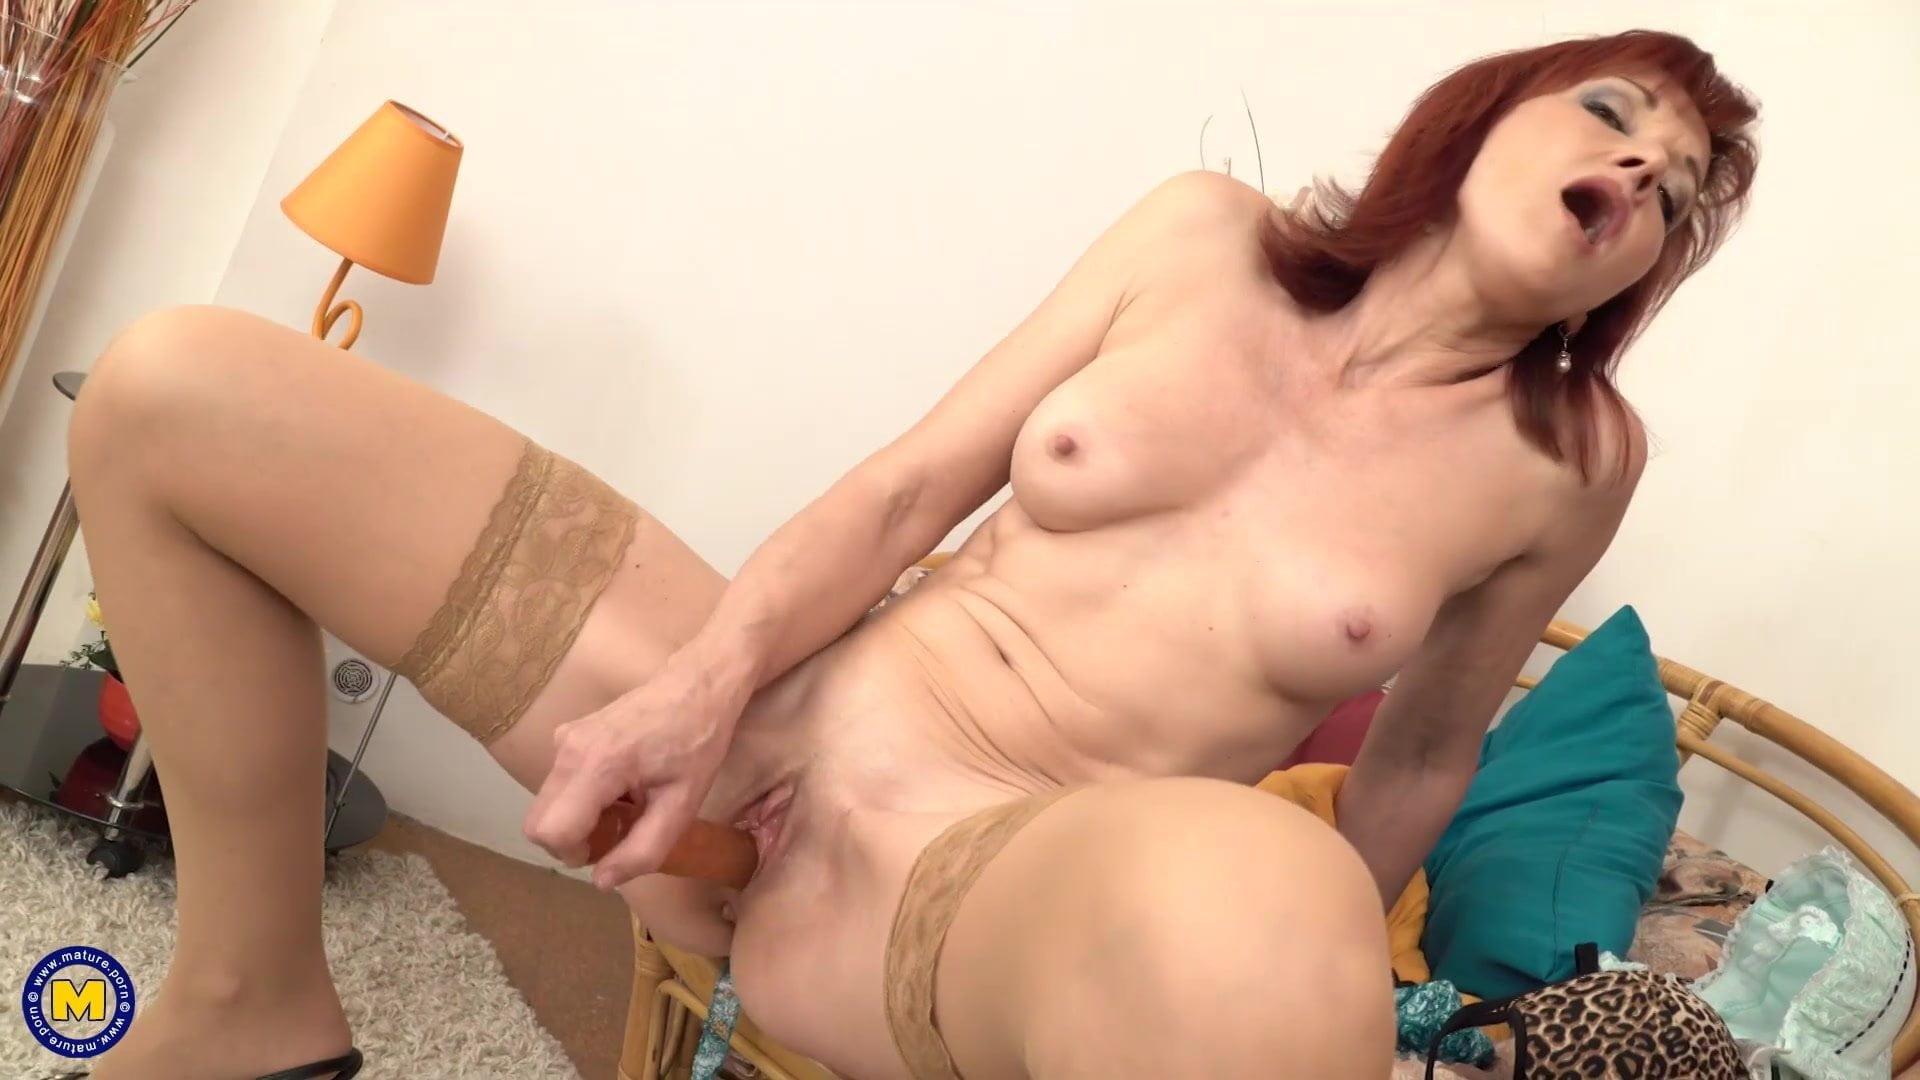 Sexy Stepmom Tara White Wears Stockings And Gets Pussy Creampie